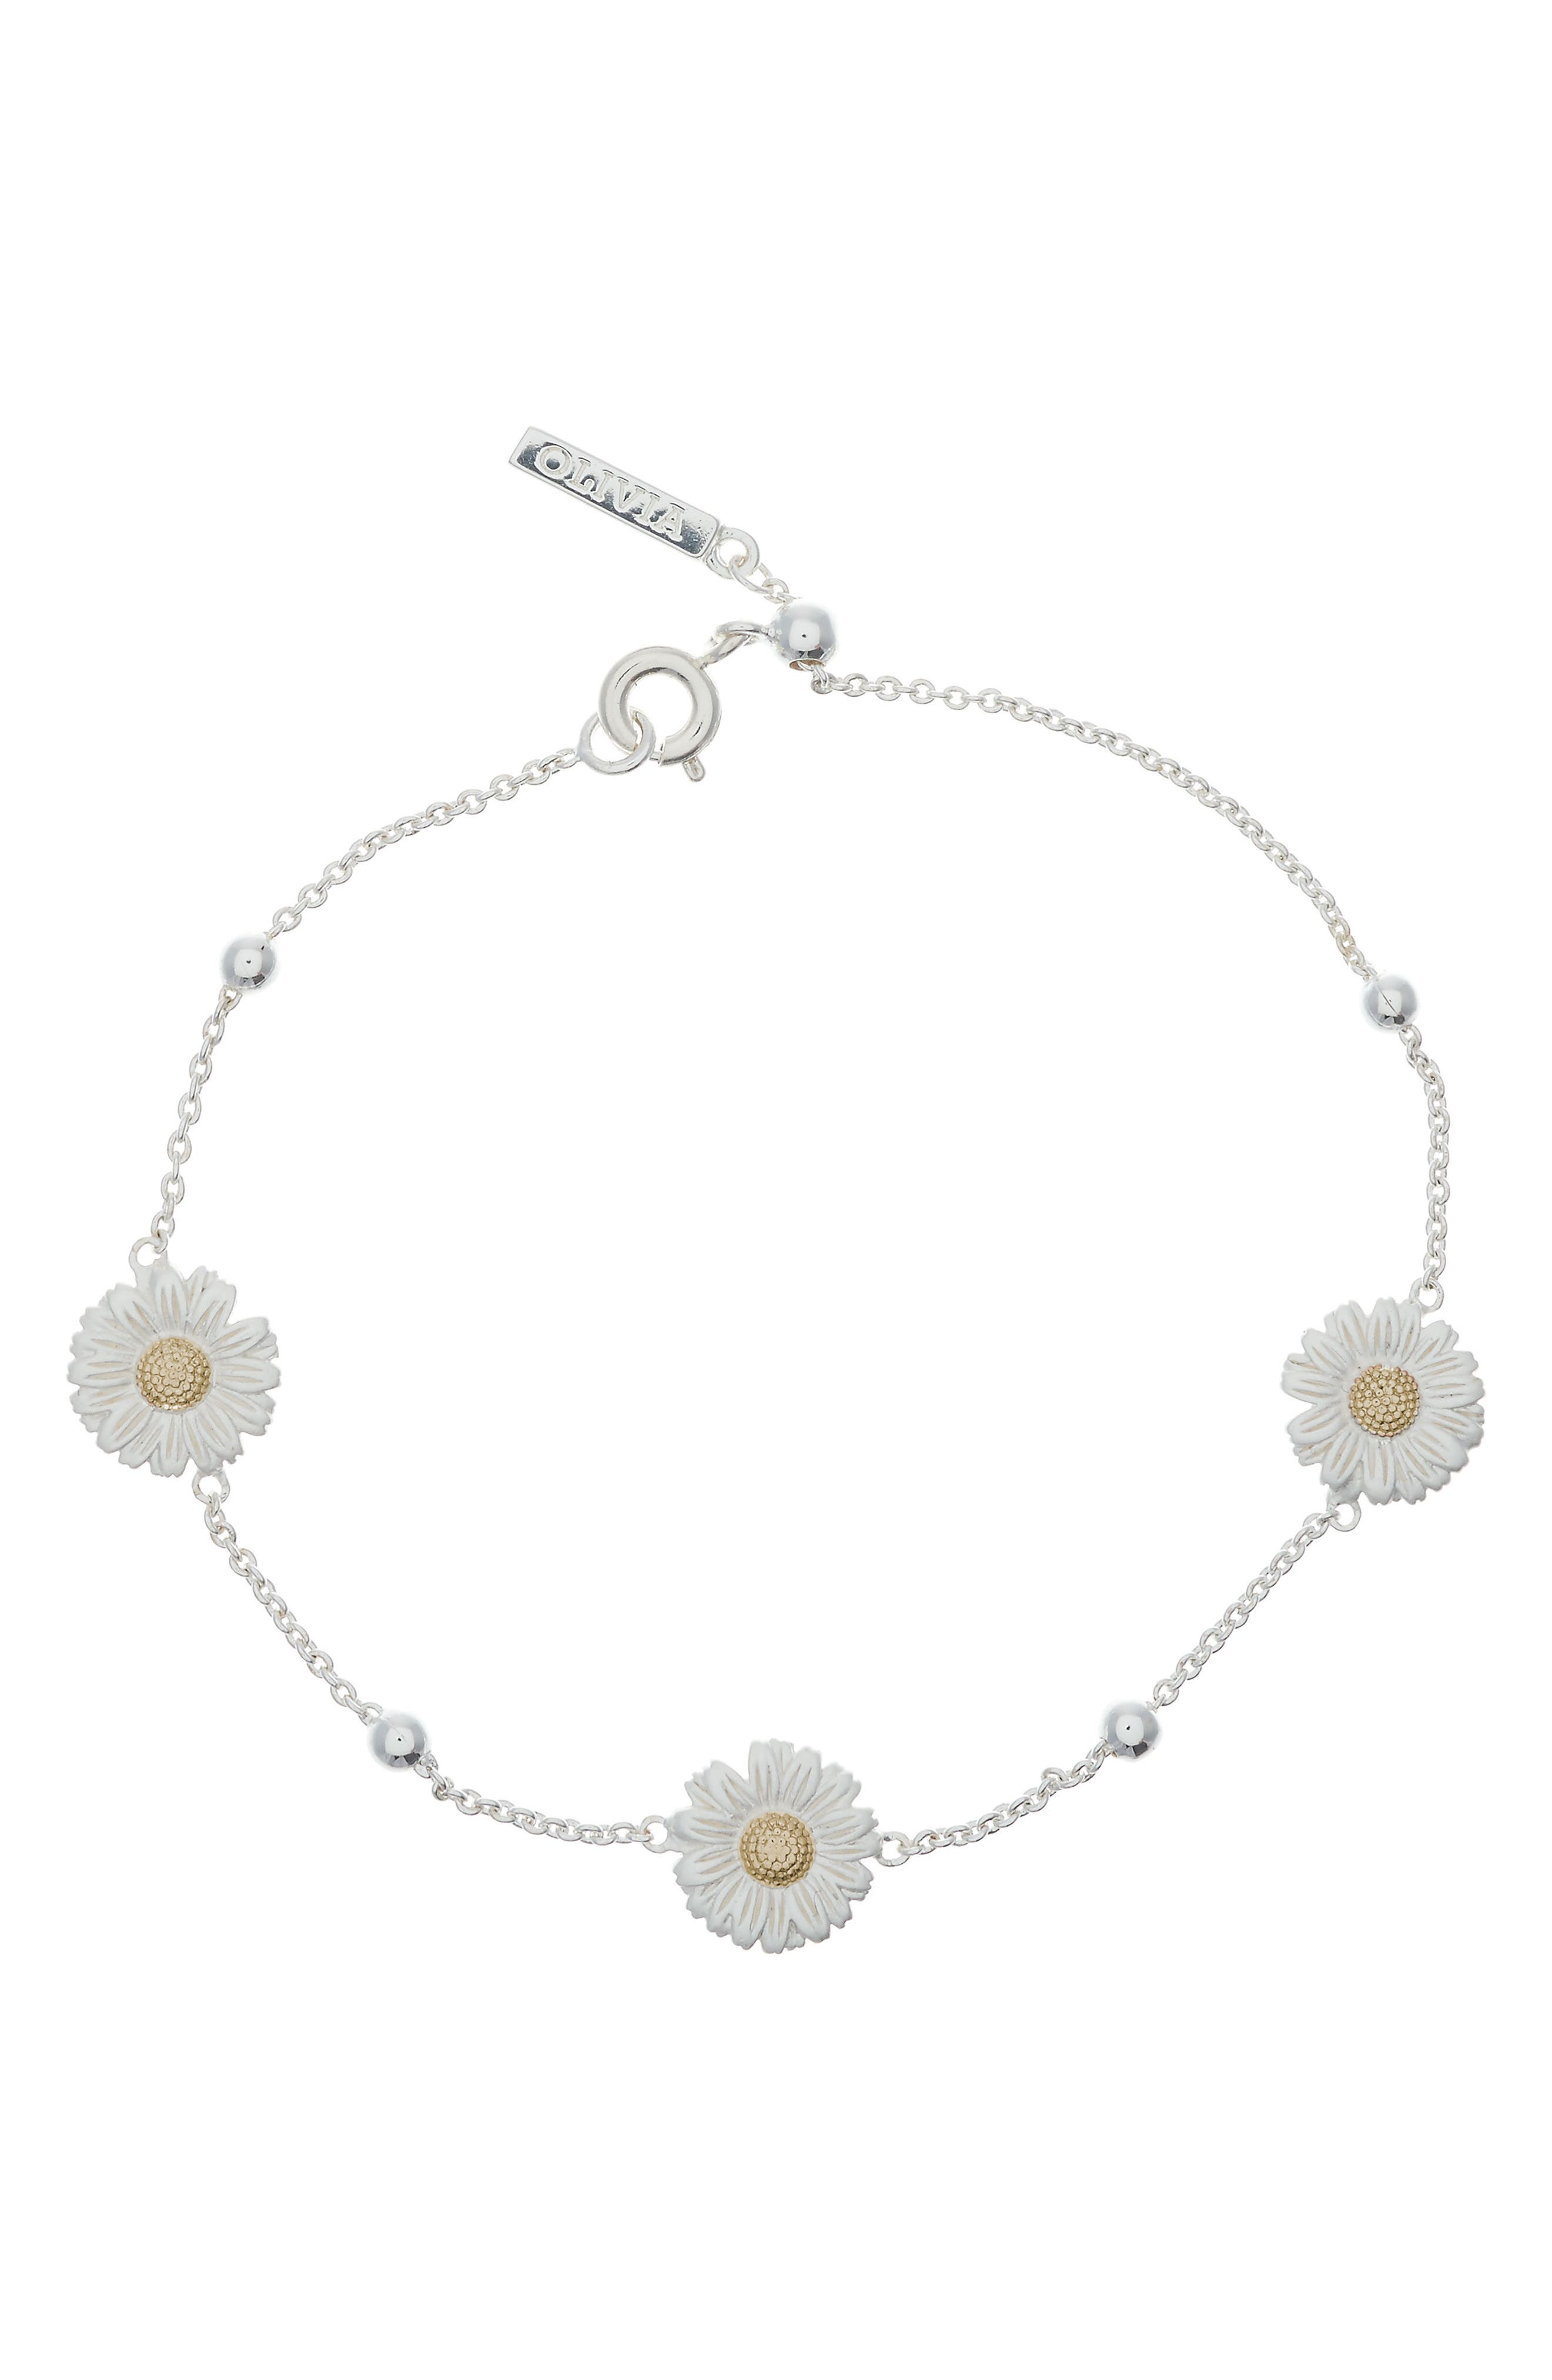 3D Daisy Ball Chain Bracelet,                         Main,                         color, Silver/ Gold